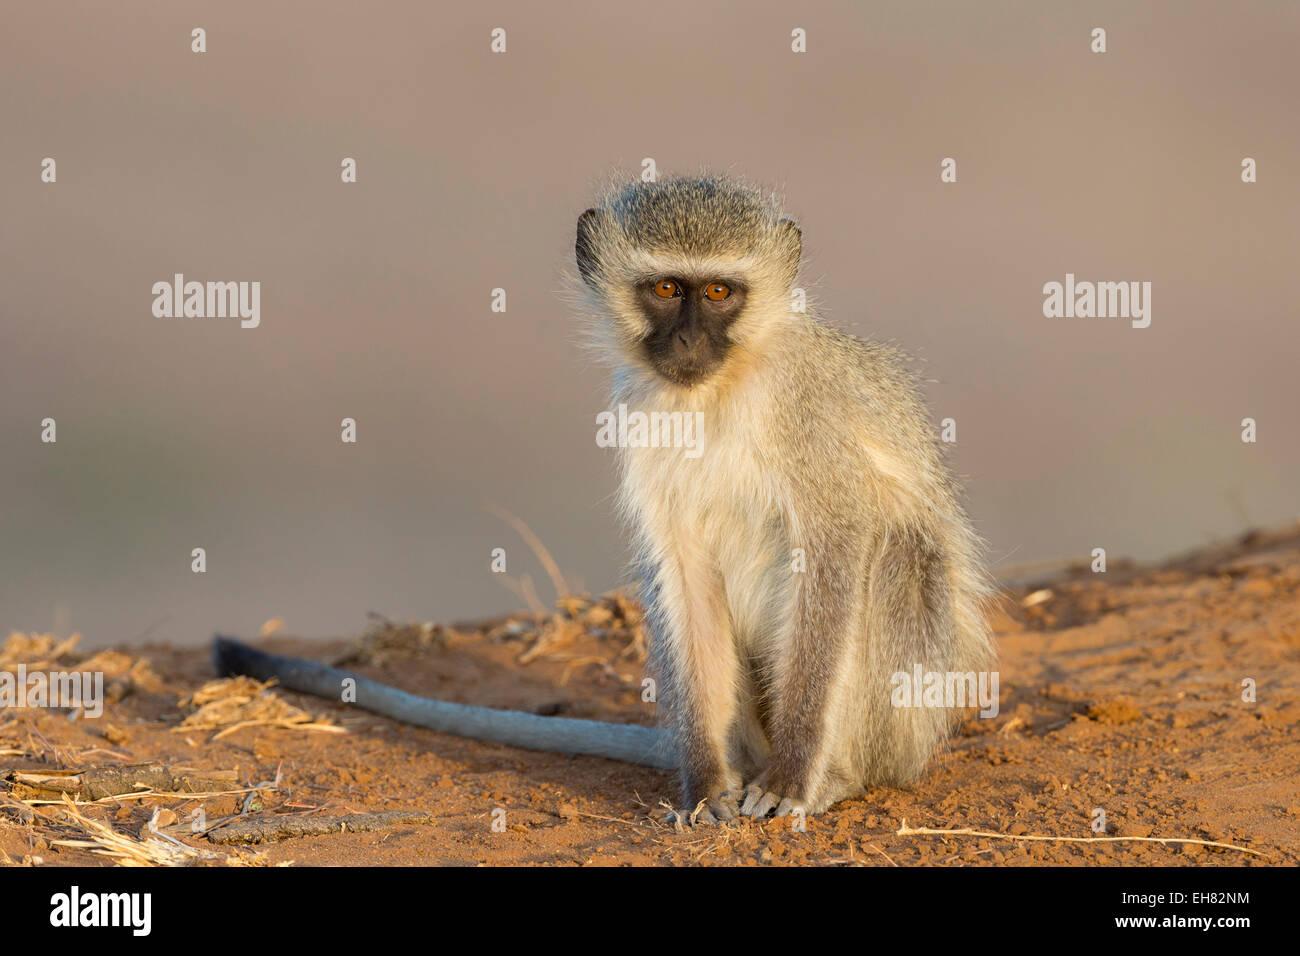 Vervet monkey (Cercopithecus aethiops), Kruger National Park, South Africa, Africa - Stock Image